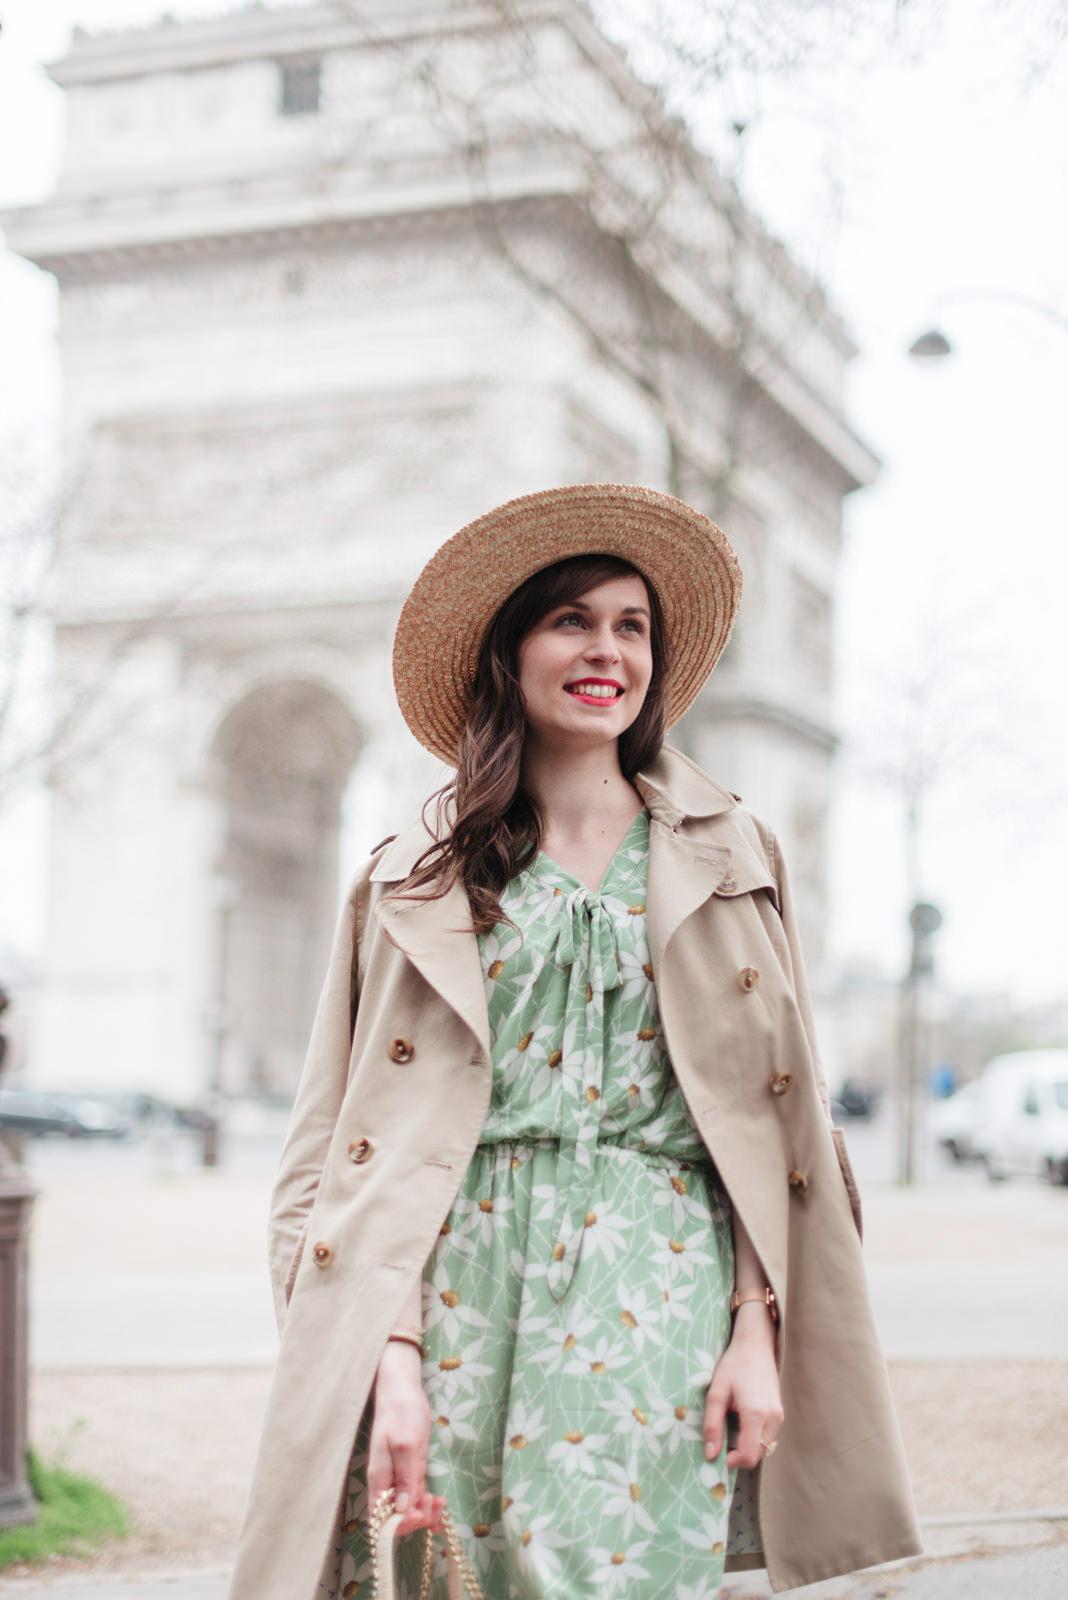 Blog-Mode-And-The-City-Looks-Robe-Fleuri-Arc-de-Triomphe-8